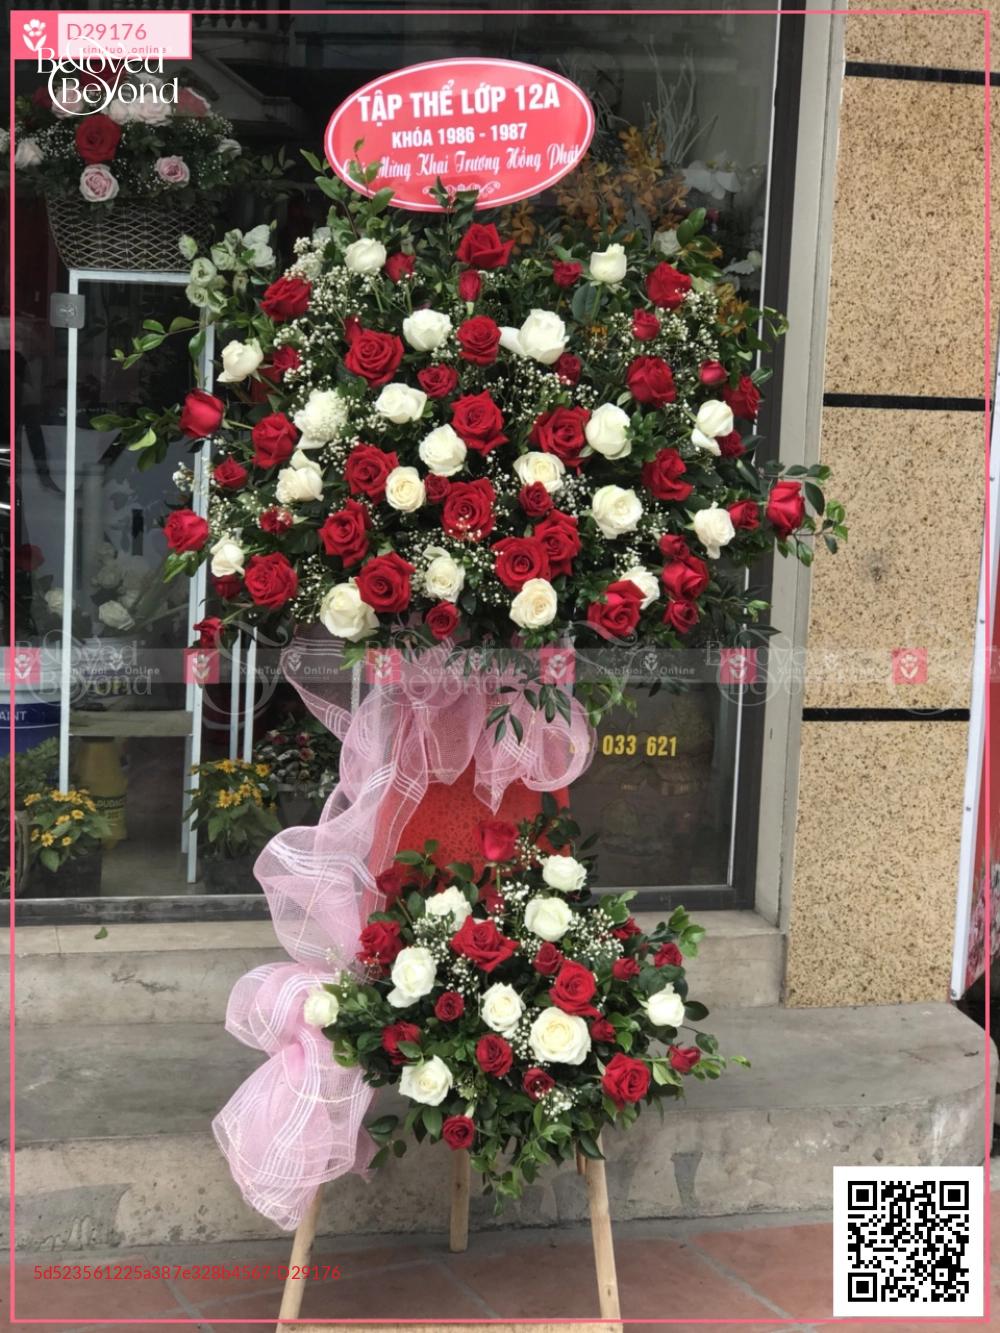 Sang trọng - D29176 - xinhtuoi.online